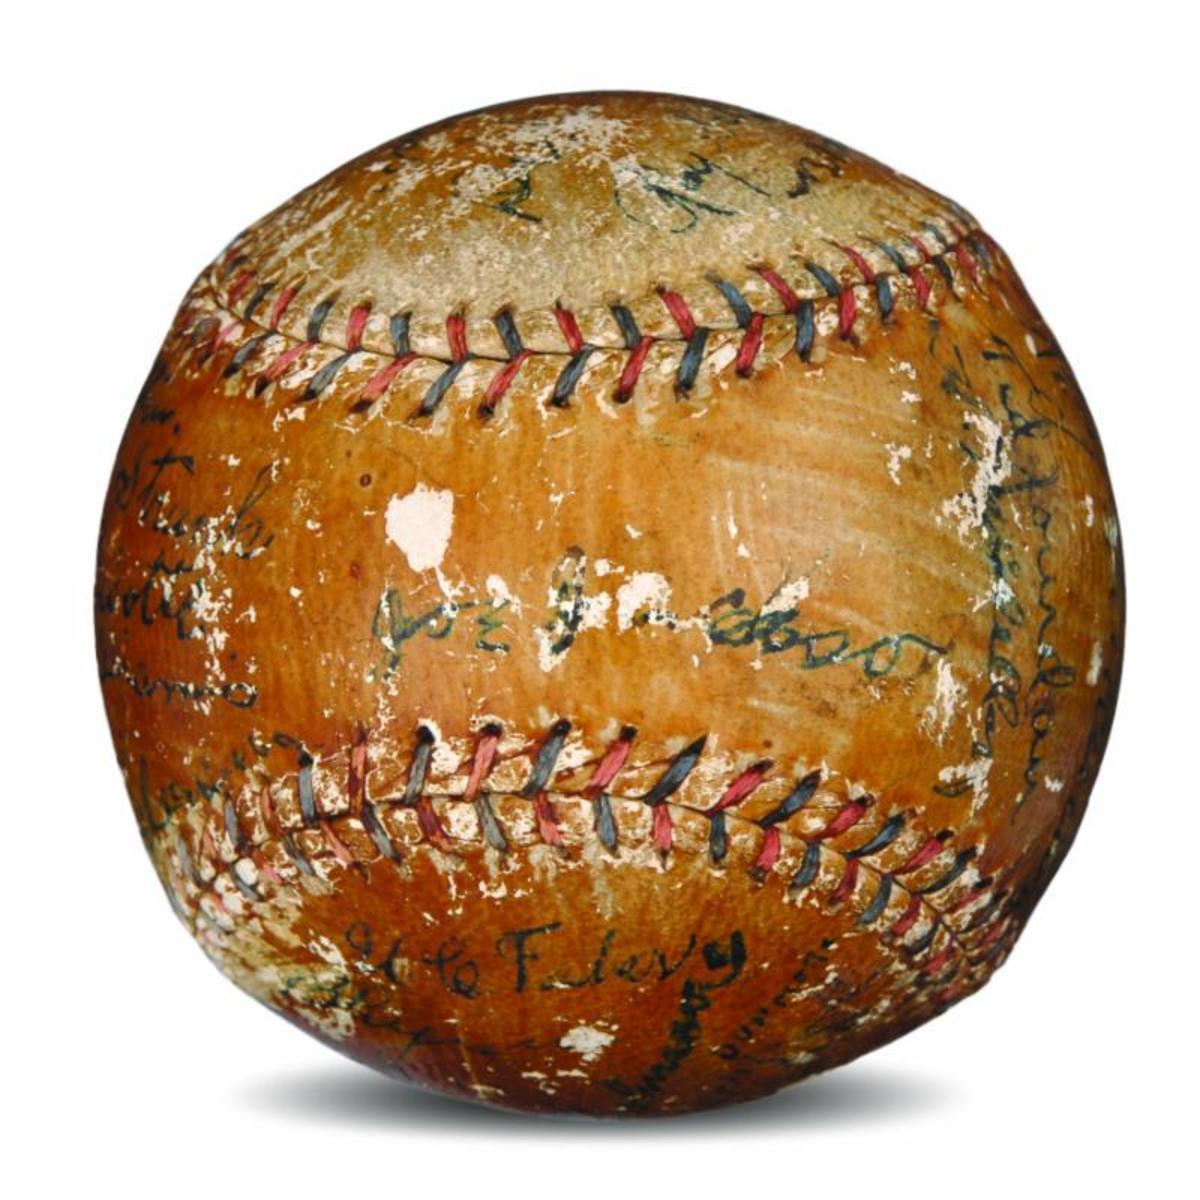 goldinblacksoxball